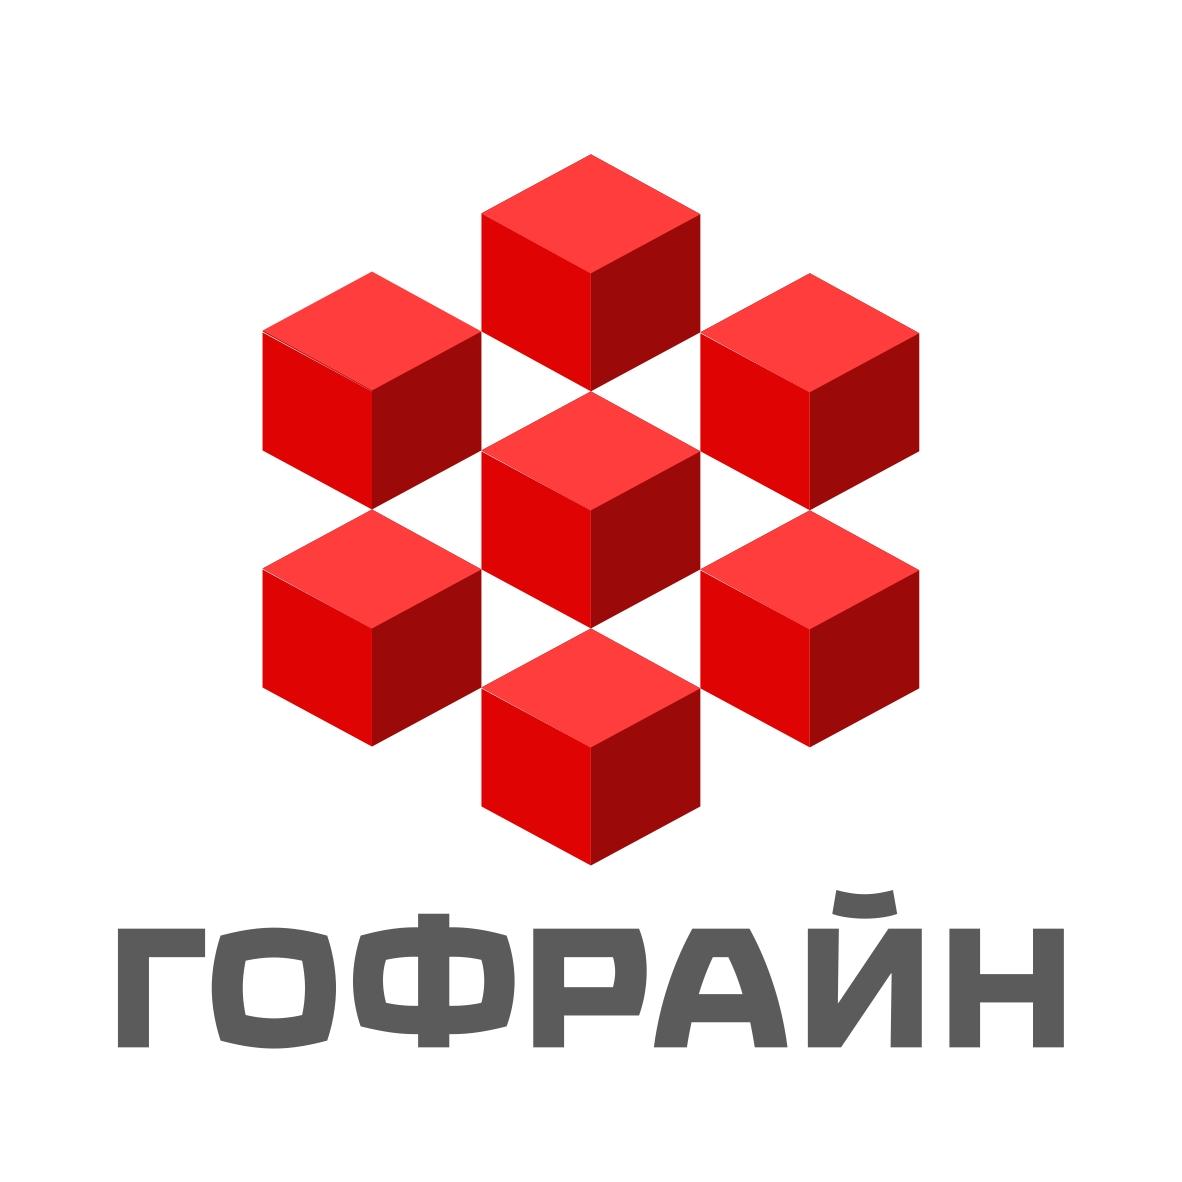 Логотип для компании по реализации упаковки из гофрокартона фото f_3855cdba63dc34fc.jpg